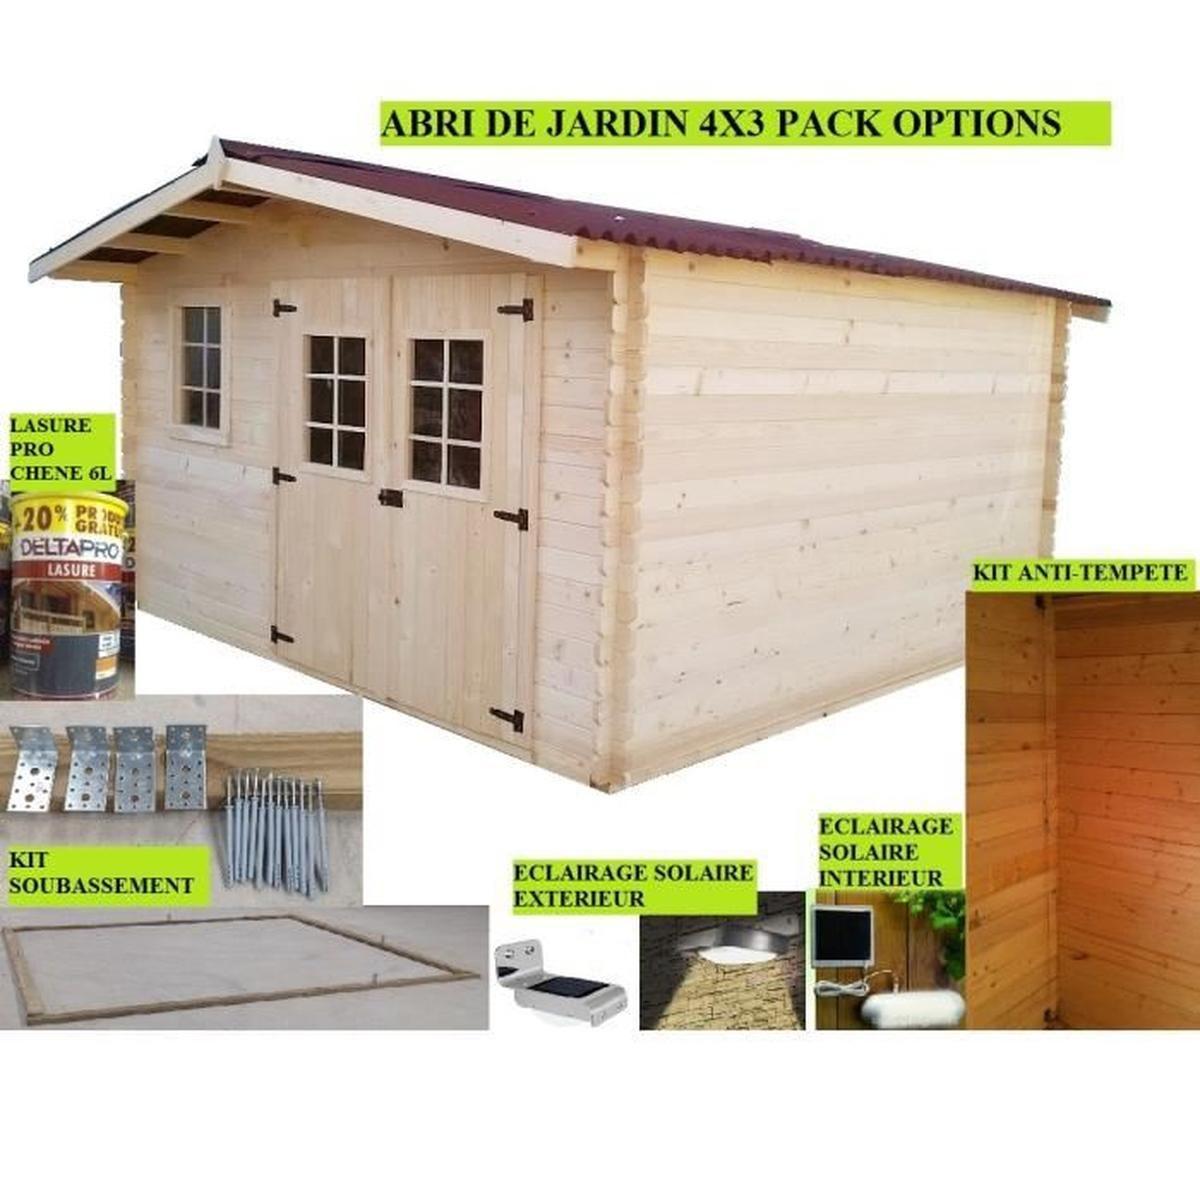 Abri De Jardin 4X3 + Pack Options - Achat / Vente Abri ... serapportantà Cdiscount Abri De Jardin